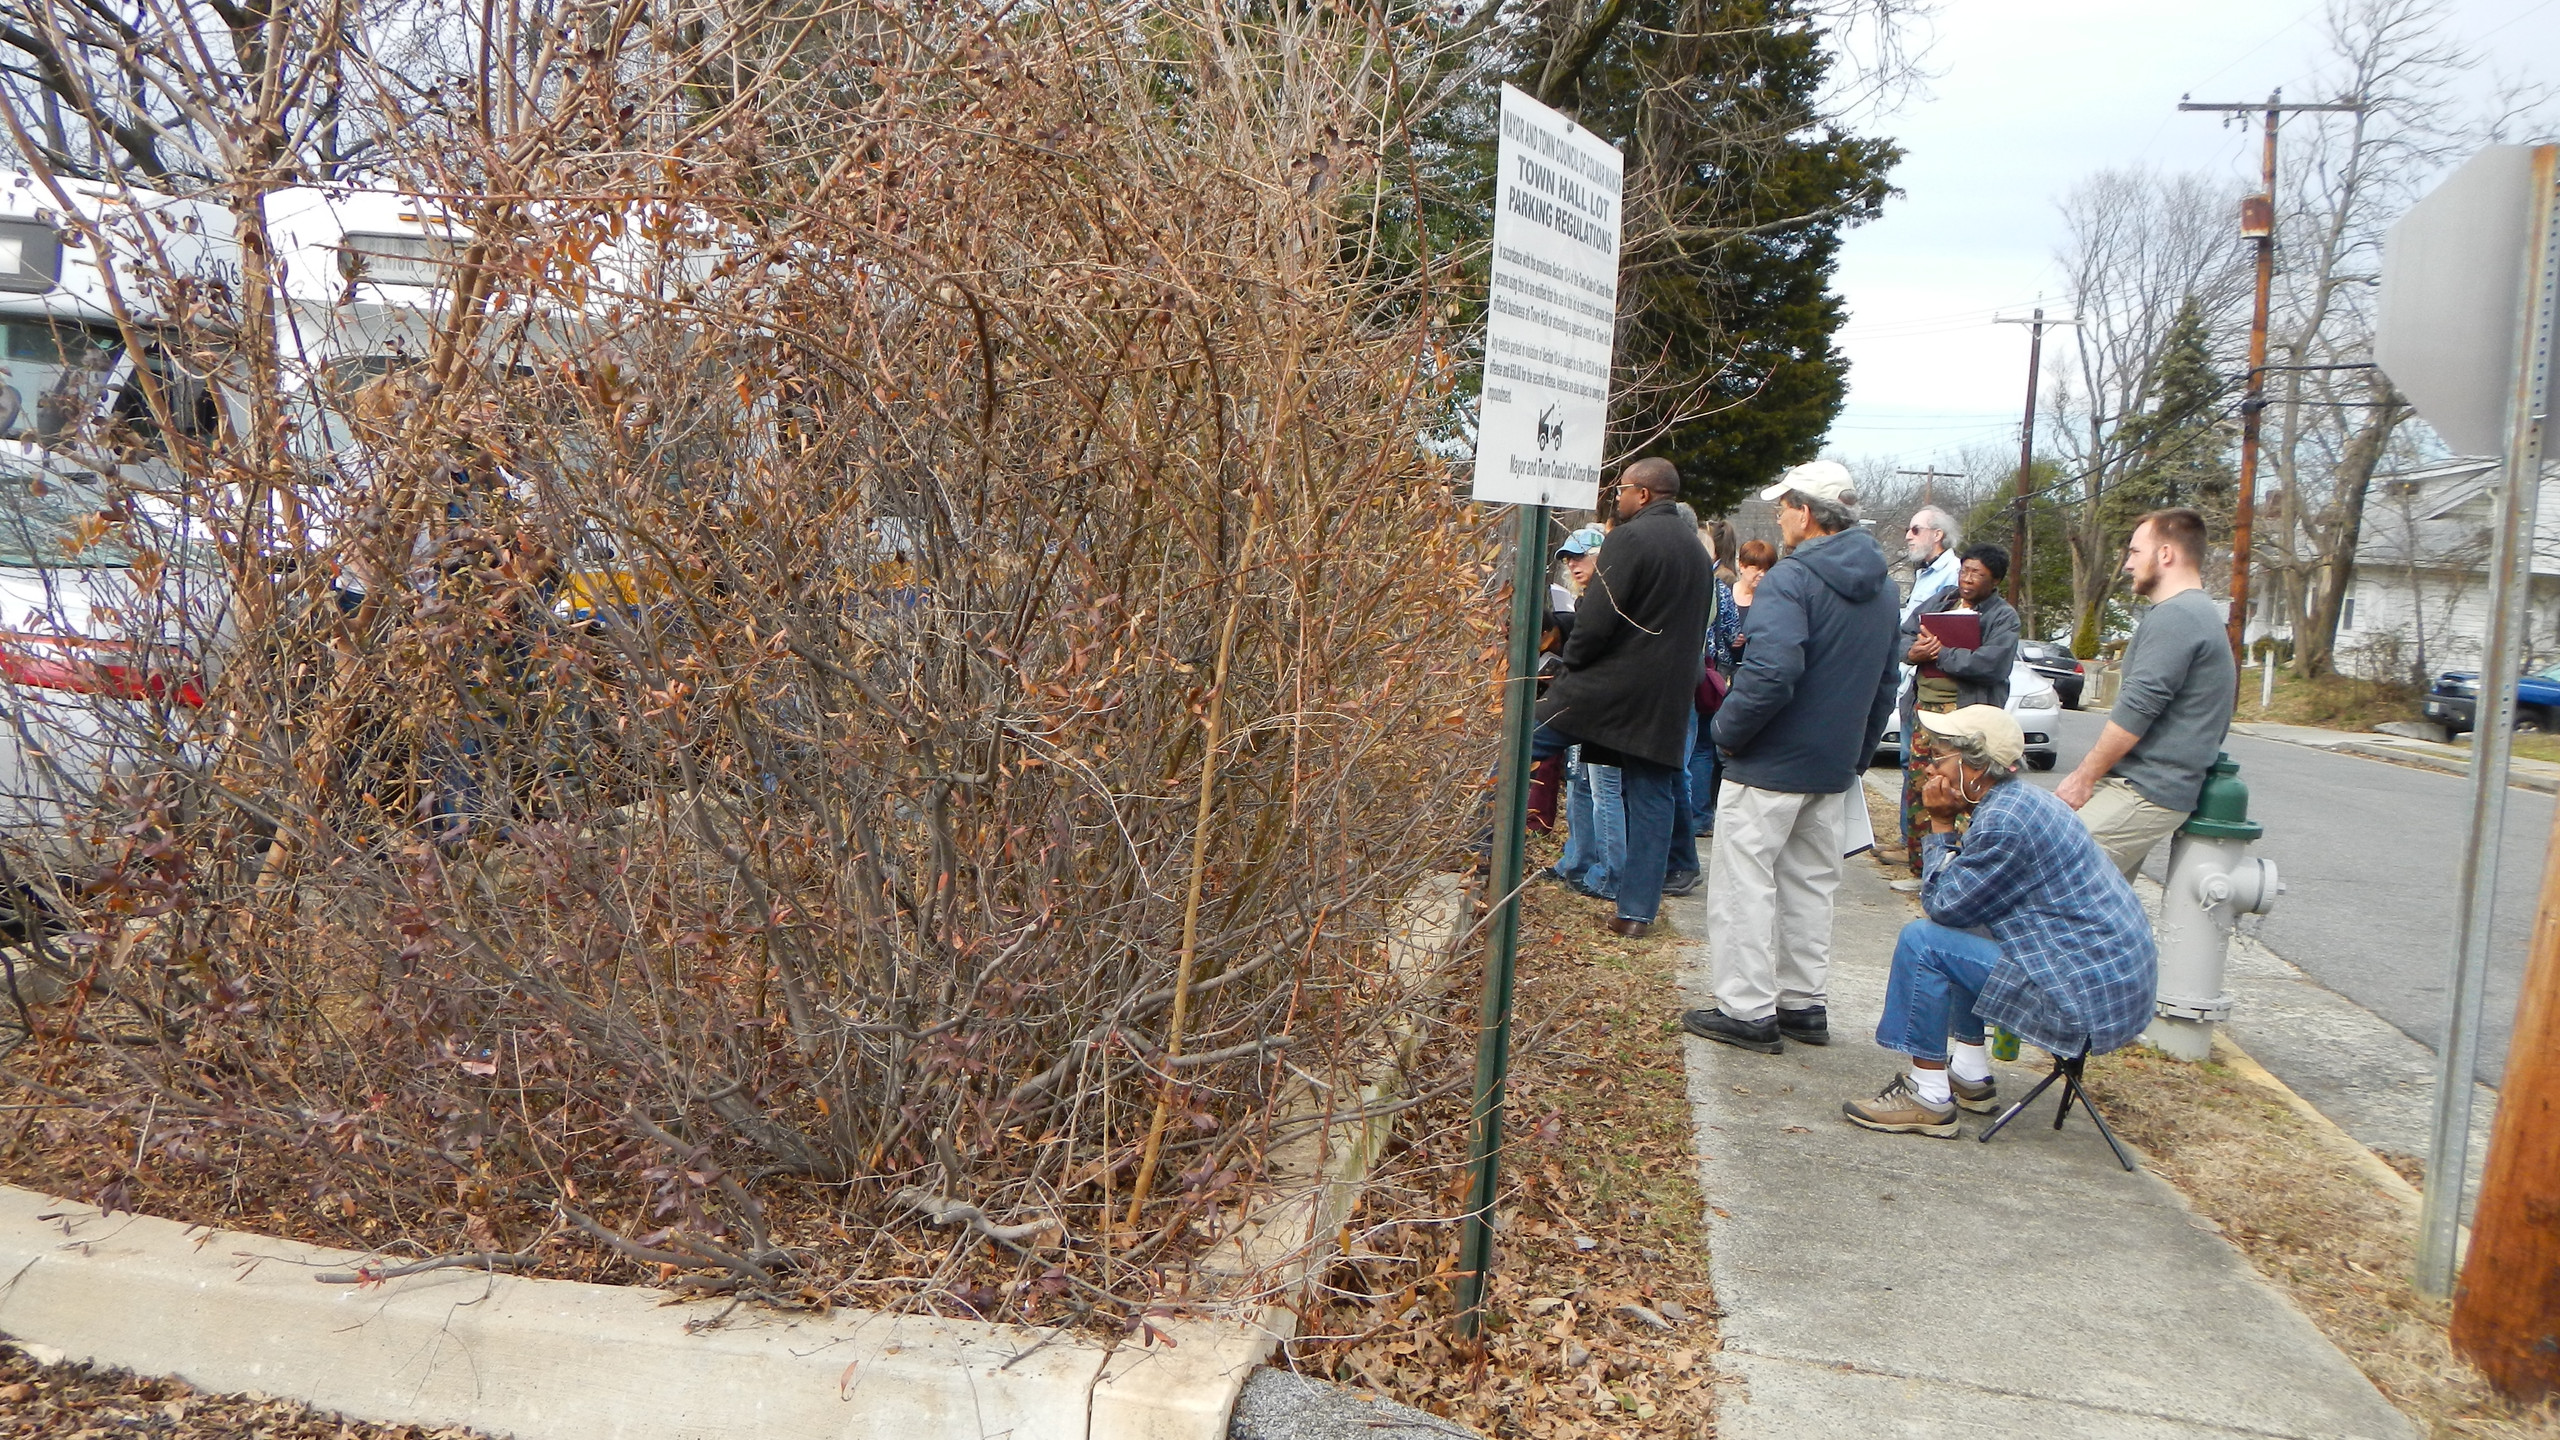 First Stop - Colmar Manor Raingarden at parking lot of community Center.